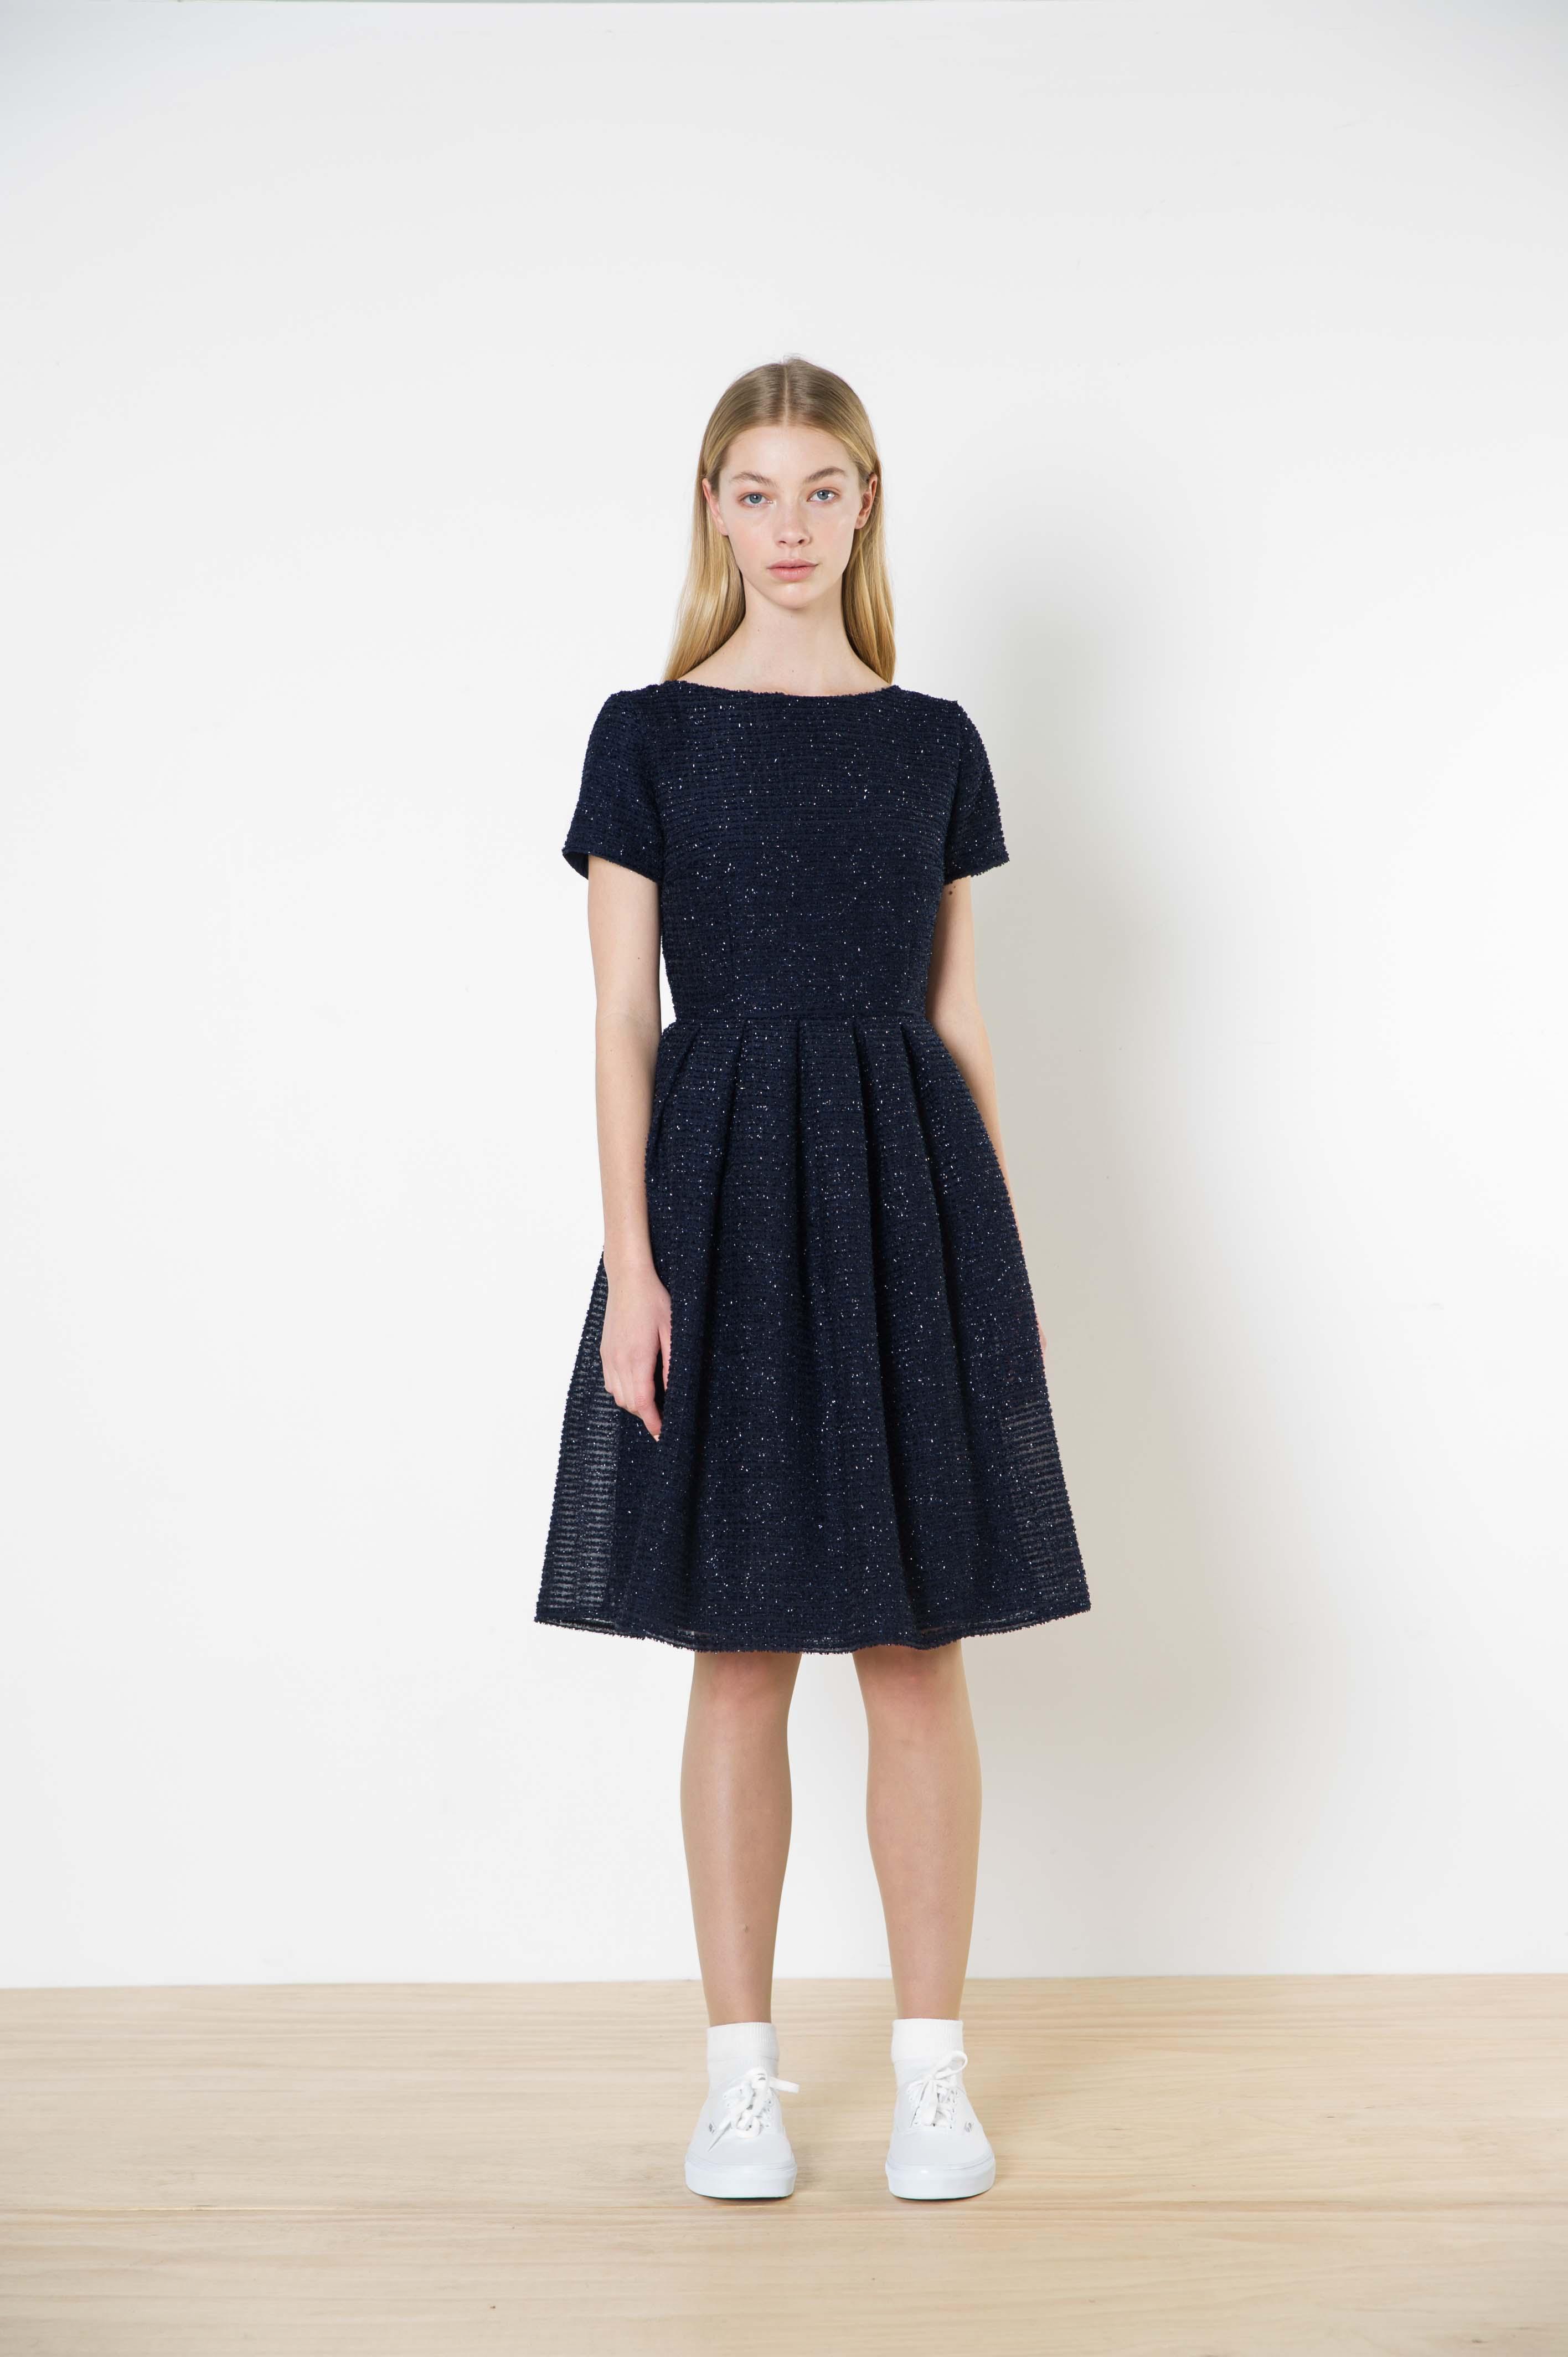 65 alexis dress